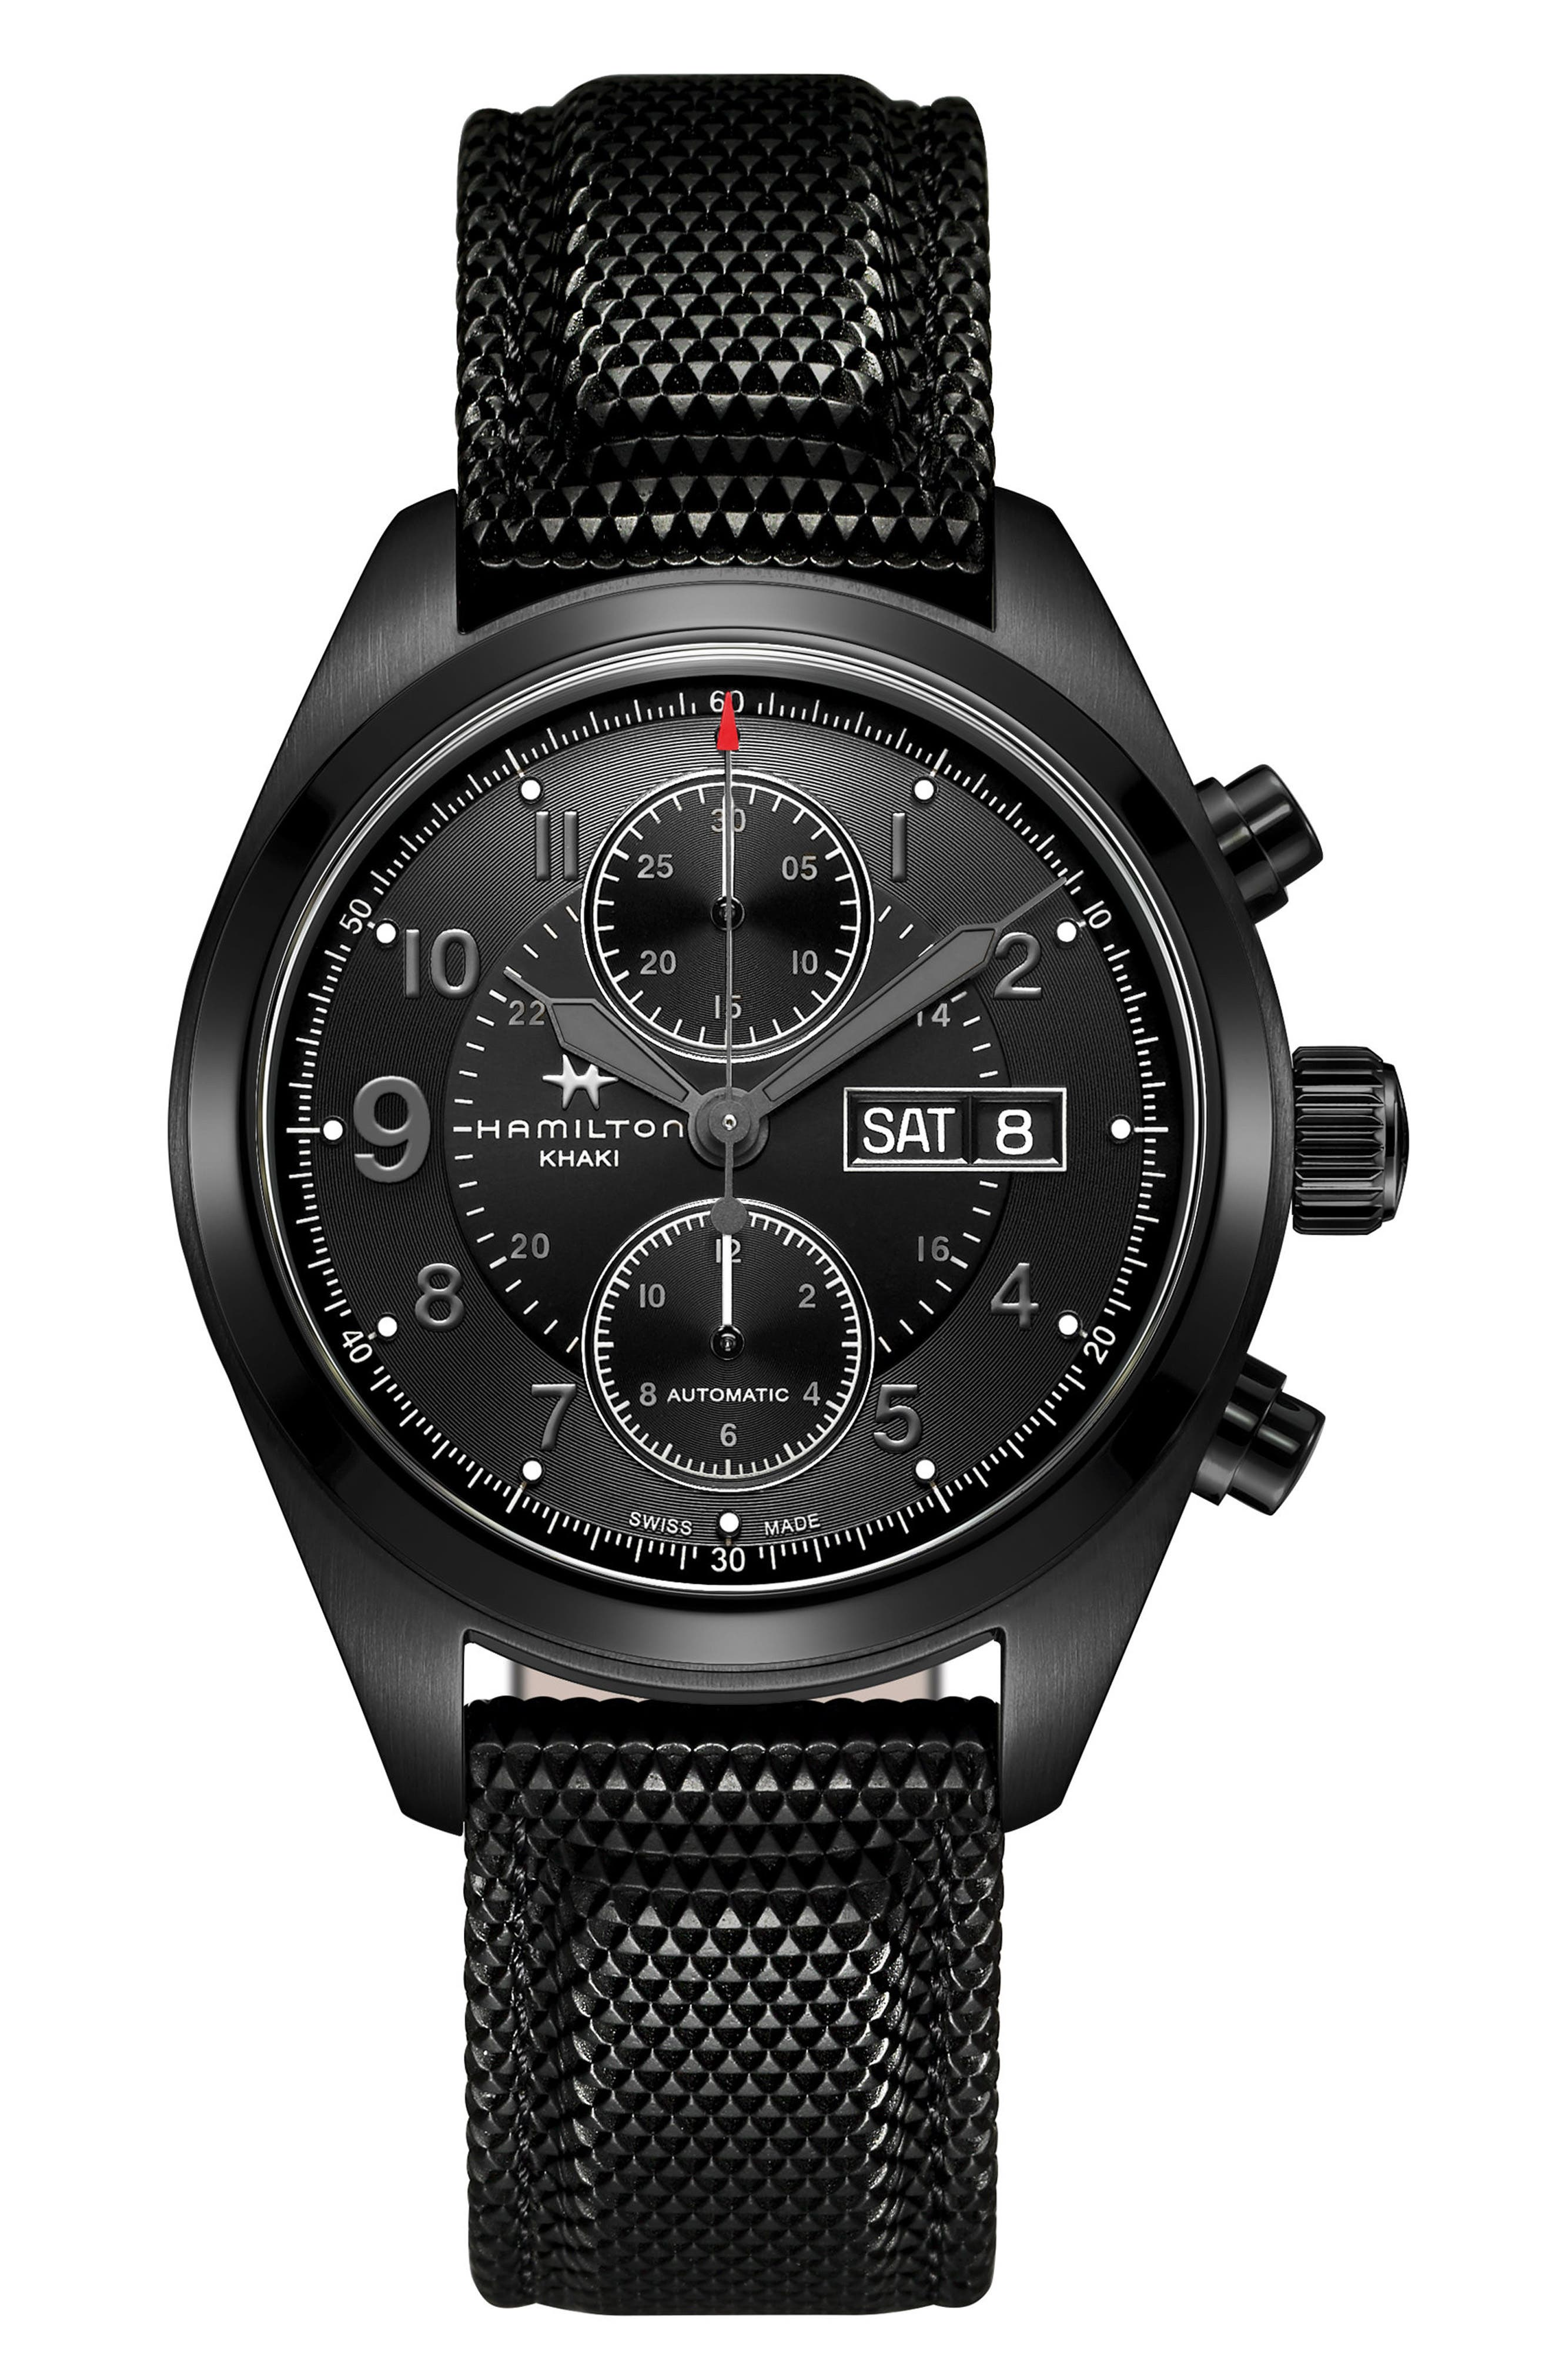 HAMILTON Khaki Field Automatic Chronograph Silicone Strap Watch, 42mm